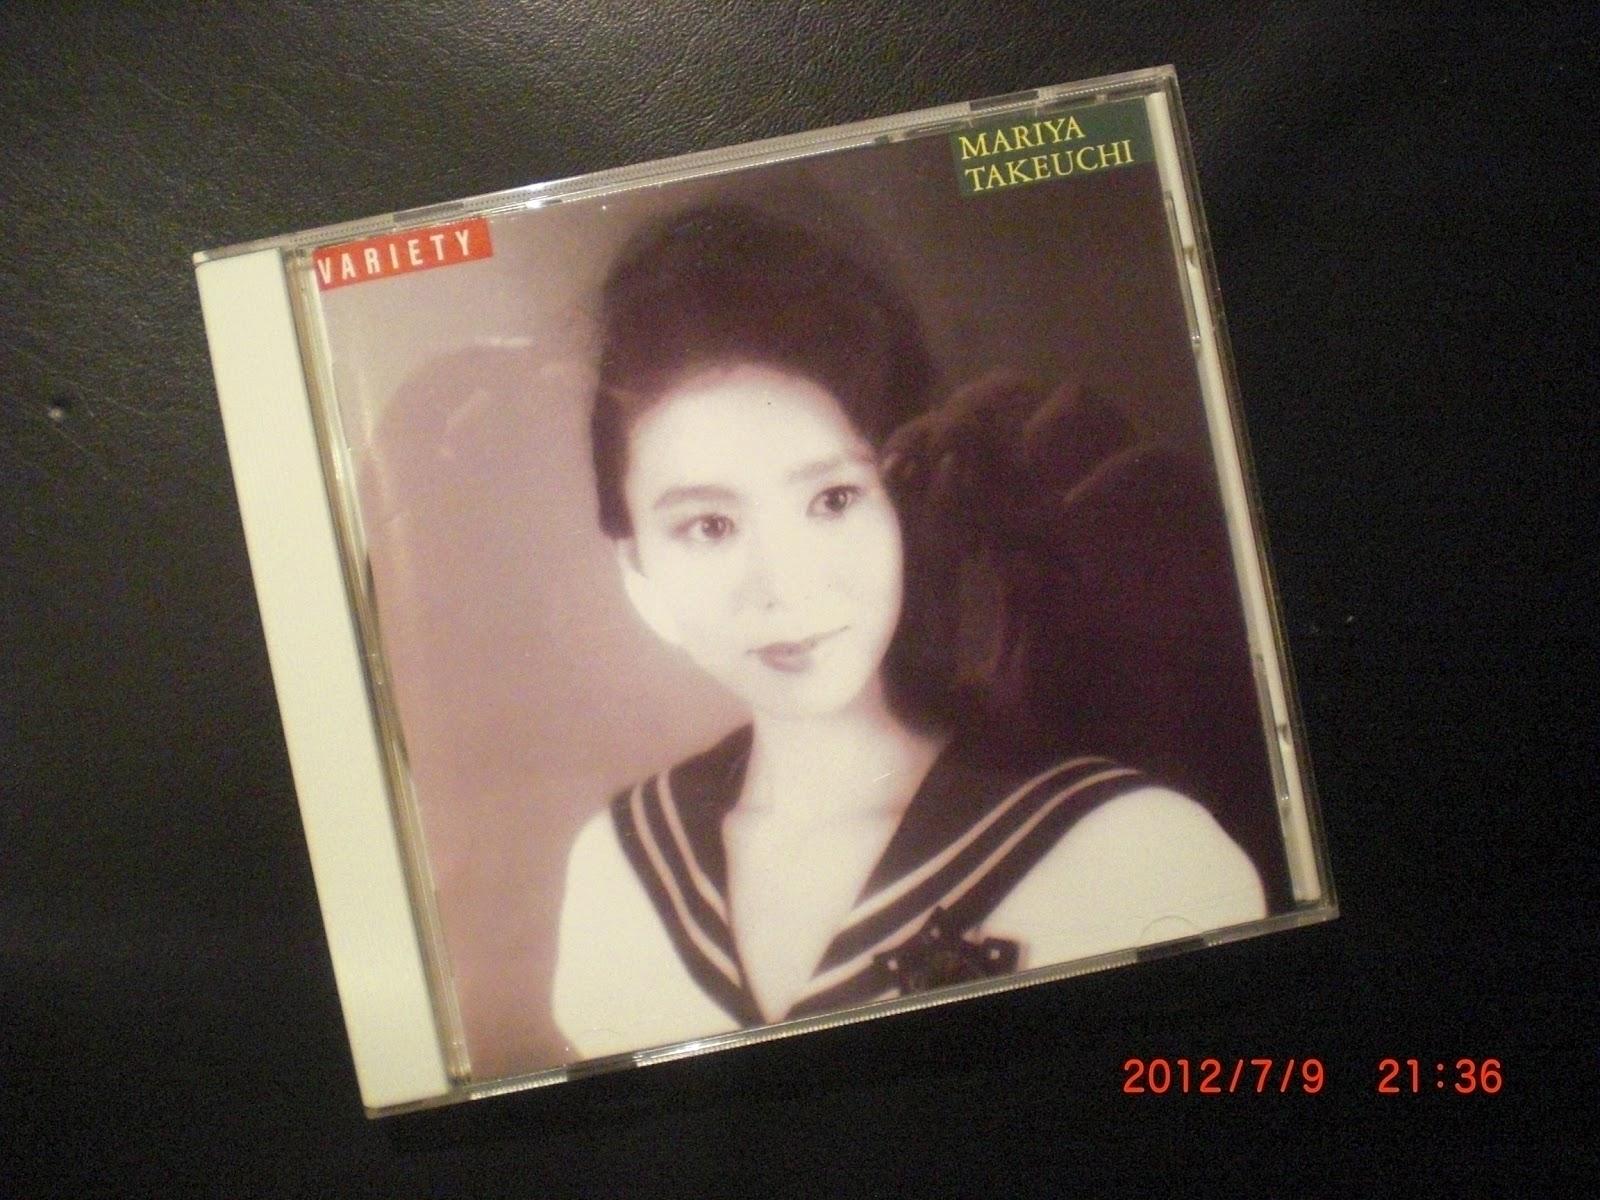 Watch Nozomi Takeuchi (b. 1980) video